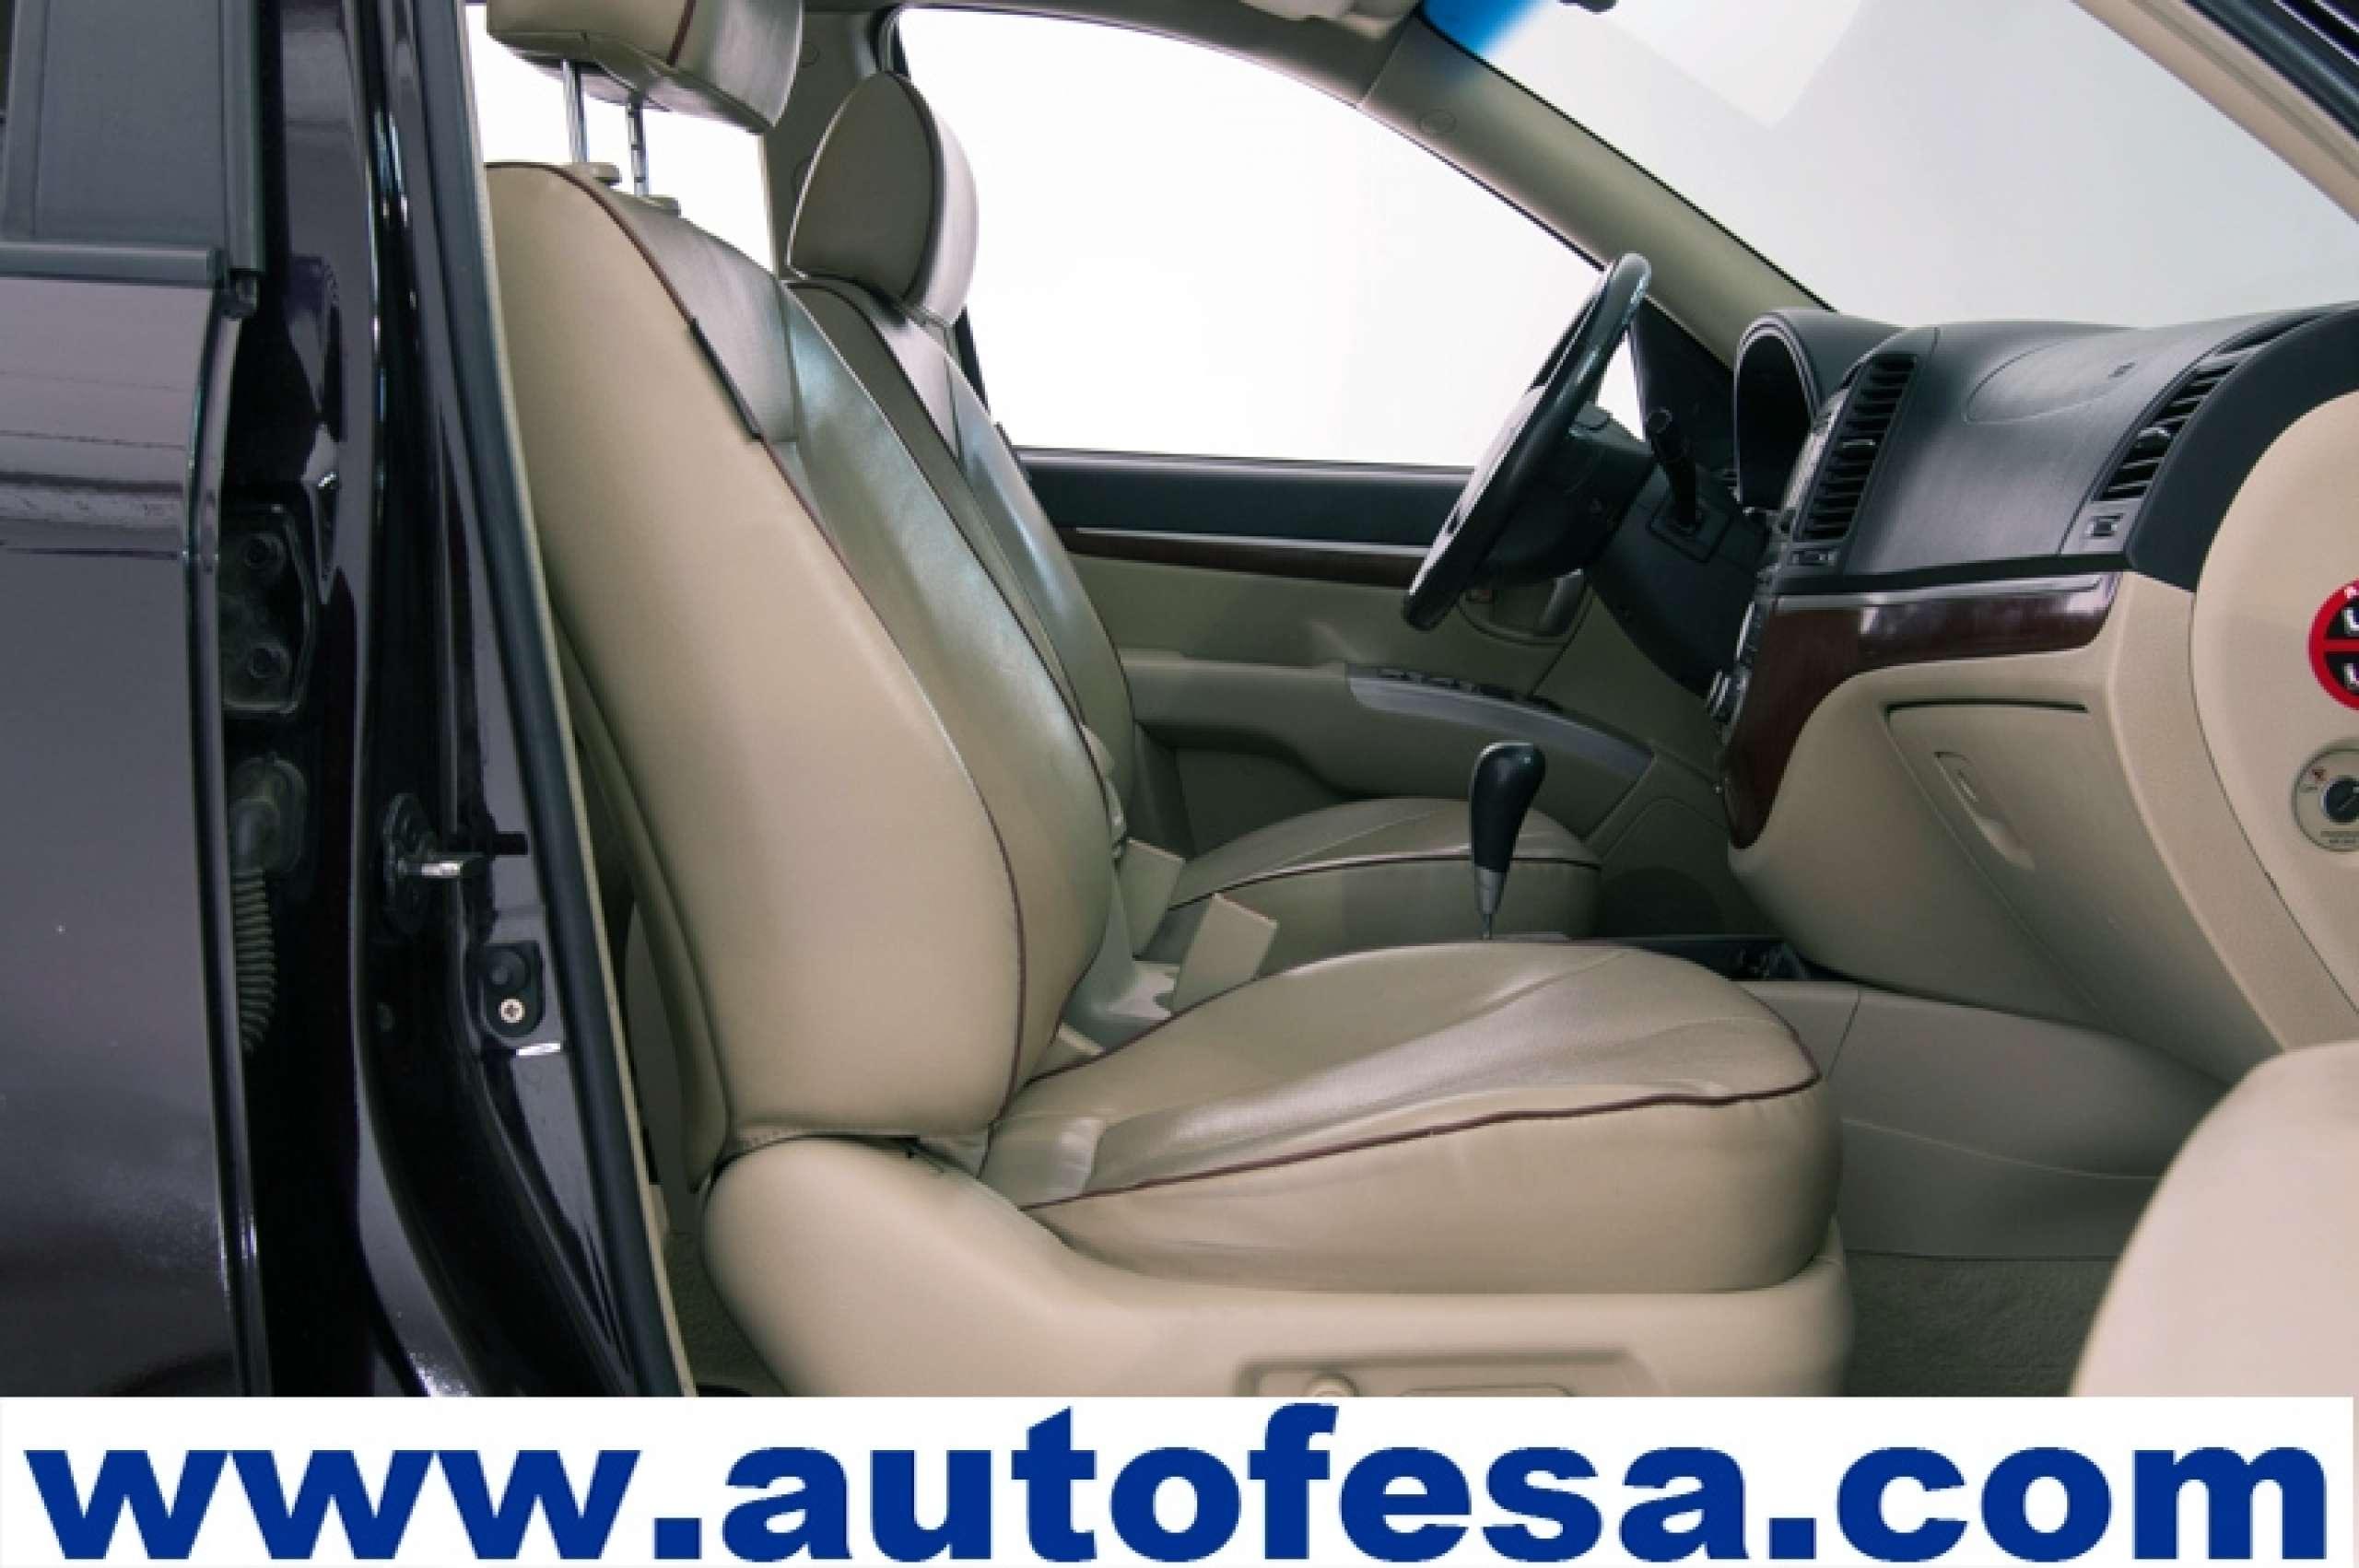 Hyundai Santa Fe 2.2 CRDI 155cv Style Auto 5p - Foto 33